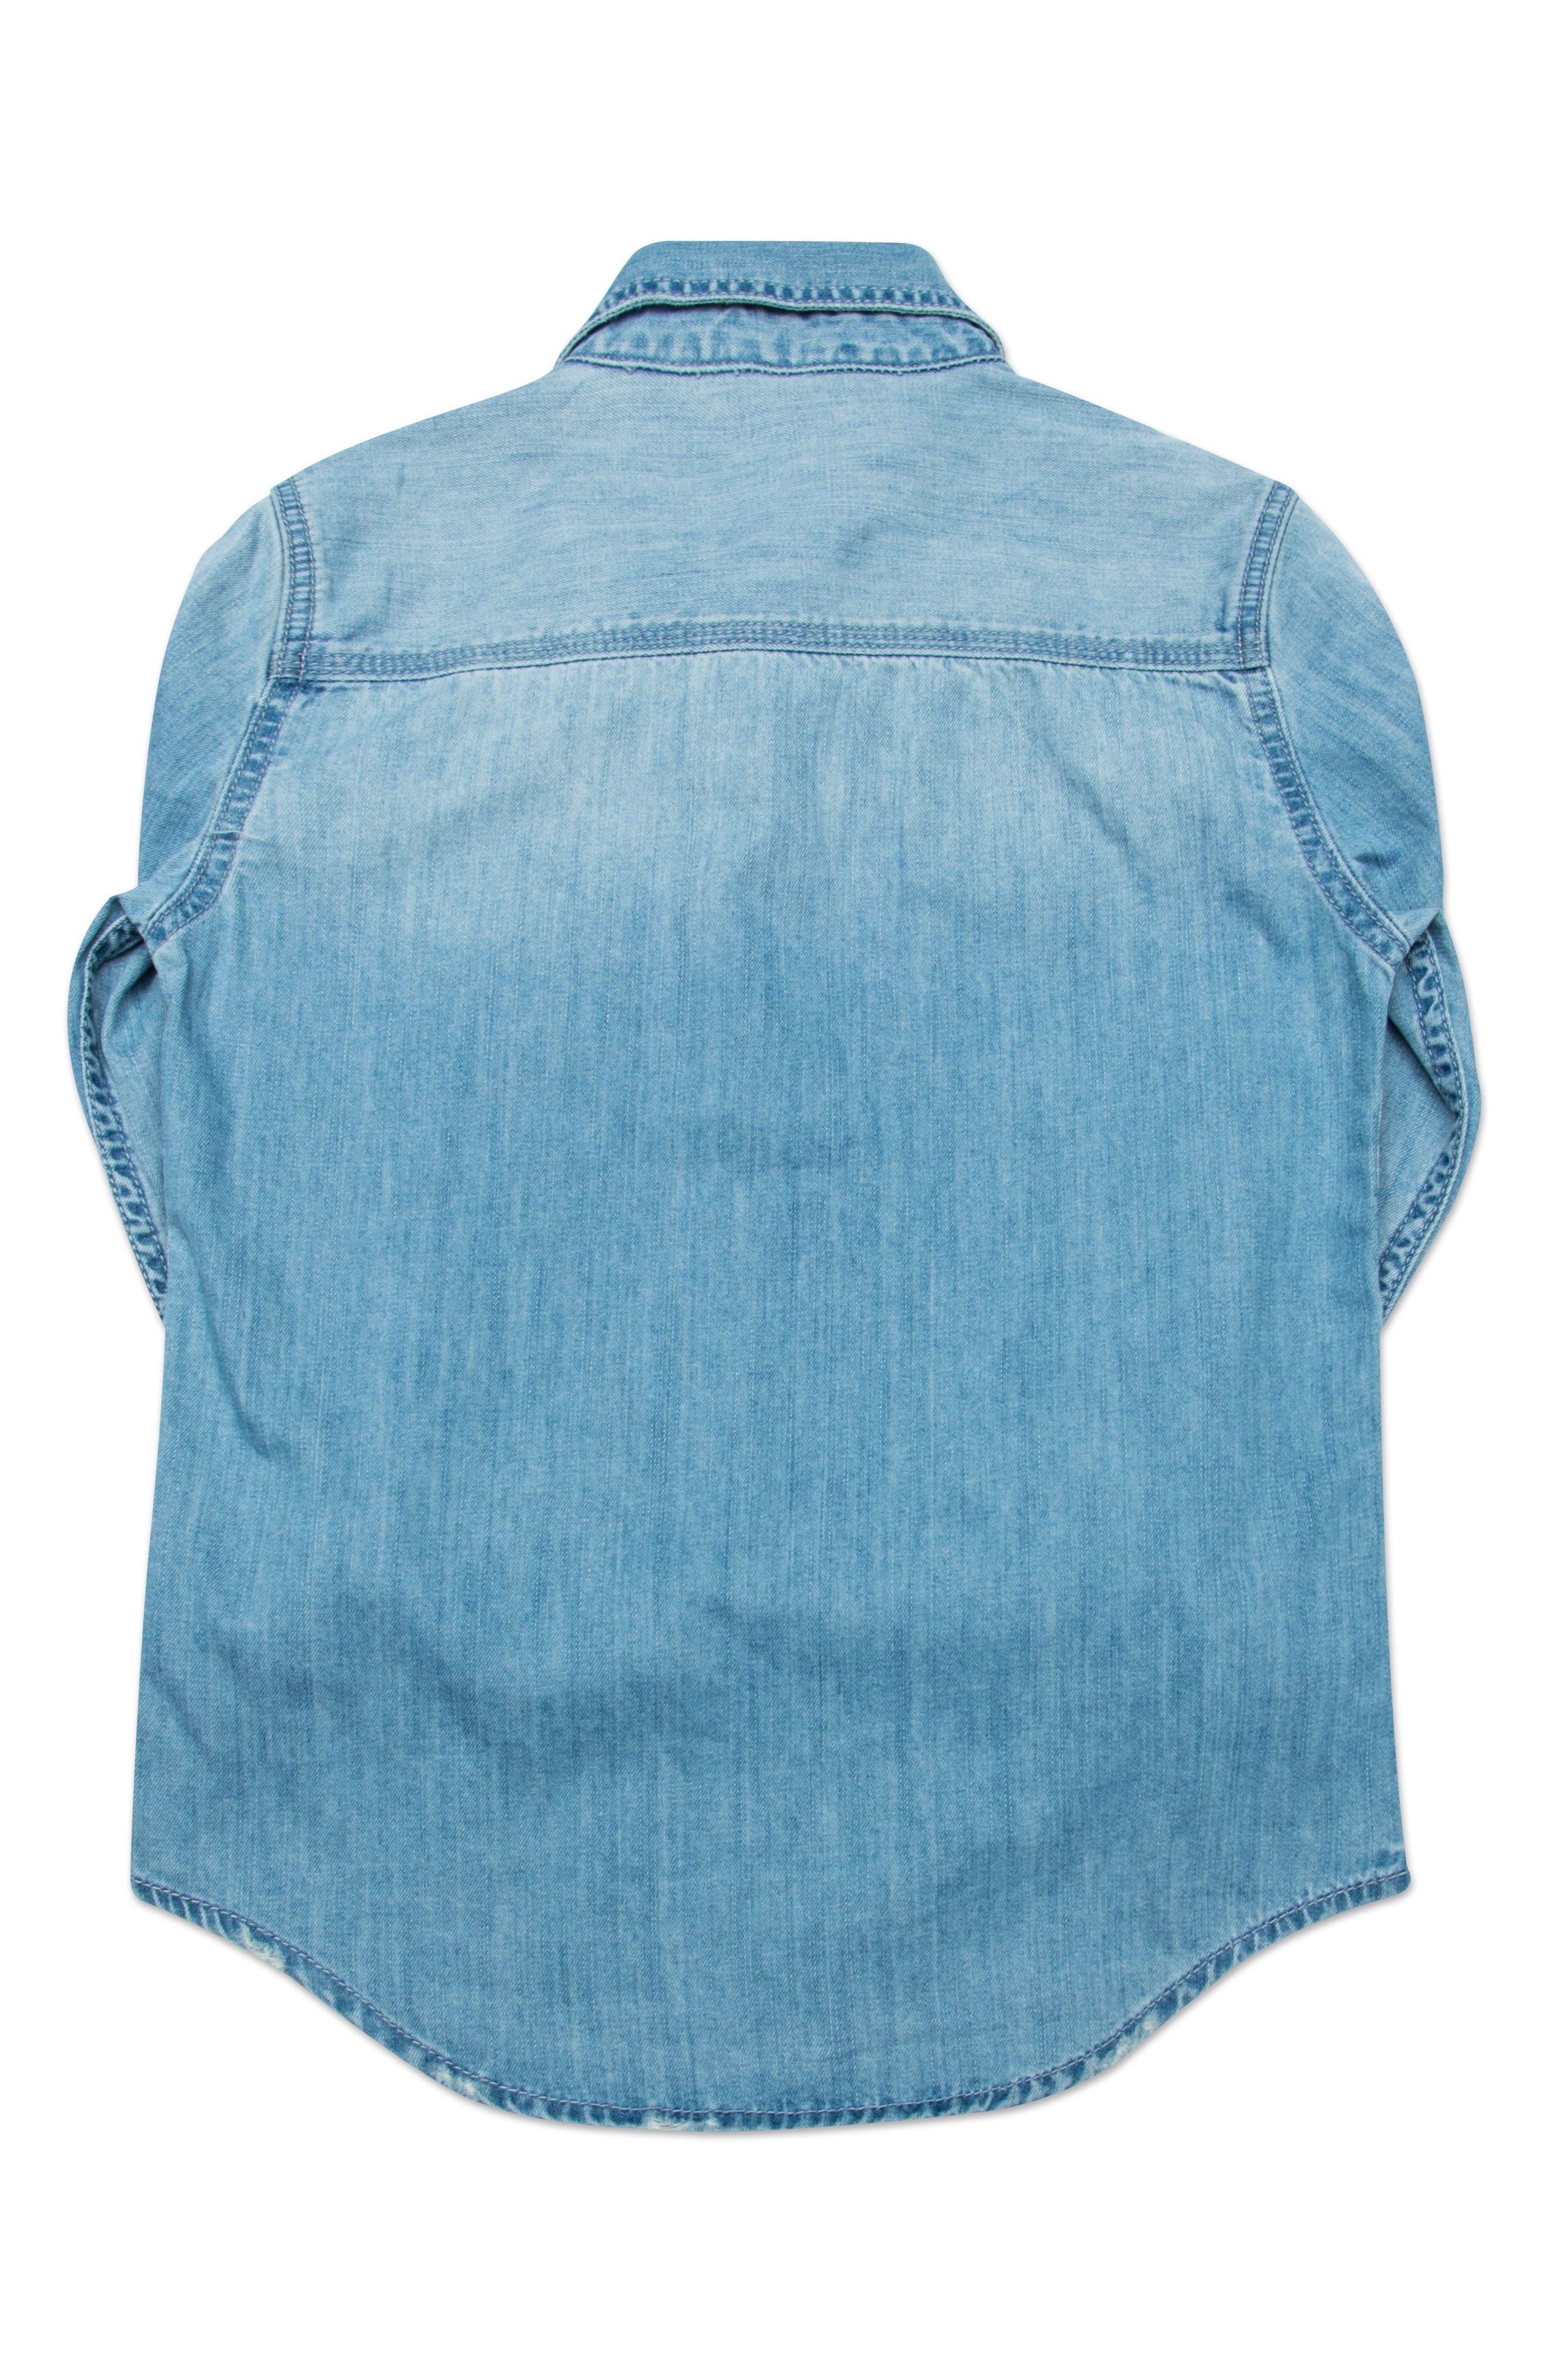 Bryon Denim Shirt,                             Alternate thumbnail 2, color,                             Ice